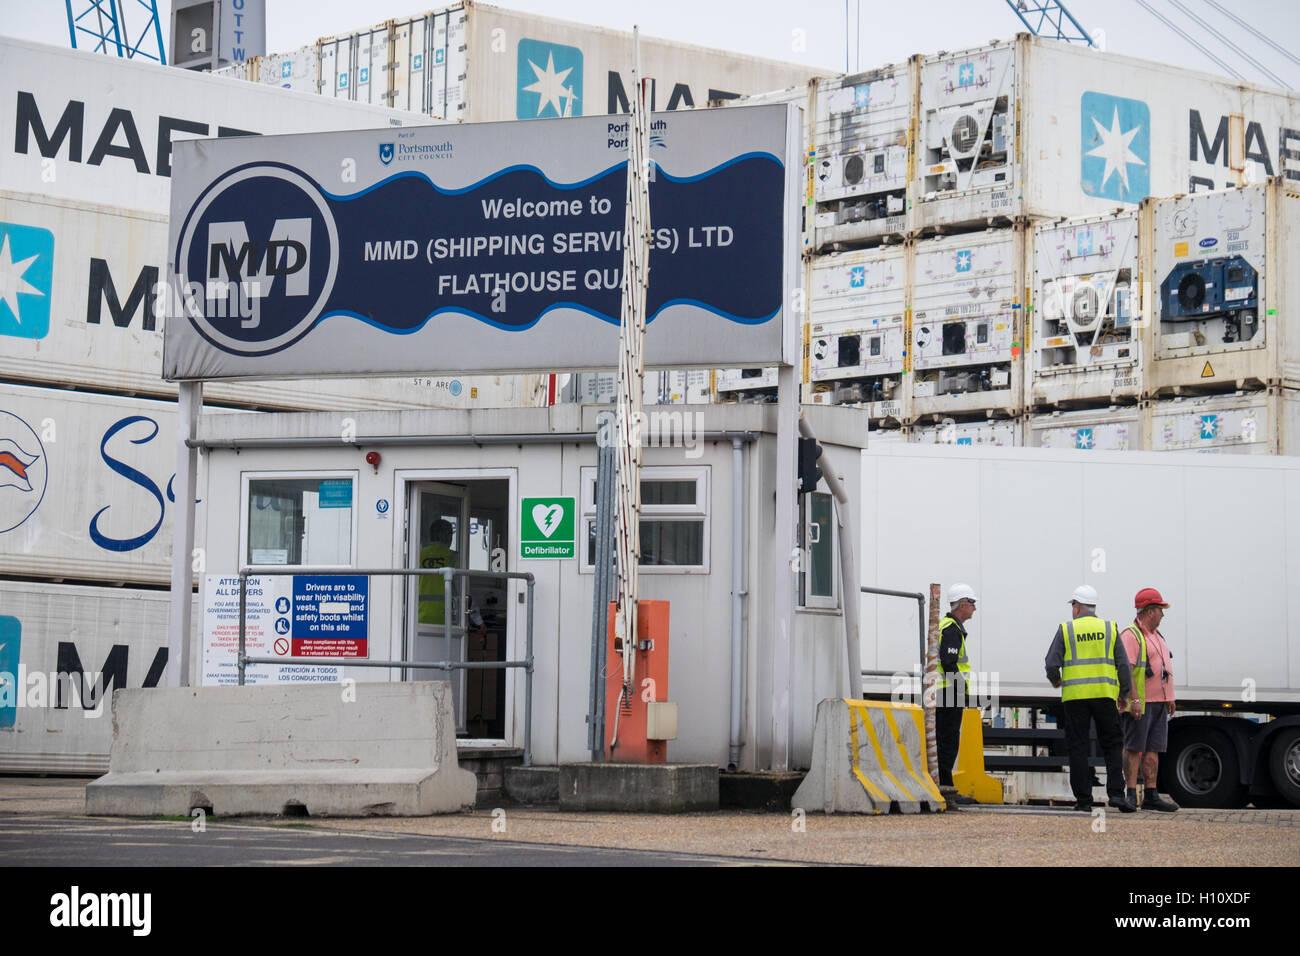 Arbeitnehmer bei Eingang des MMD Shipping Services Ltd Hof an Flathouse Quay in Portsmouth Dockyard. Stockbild